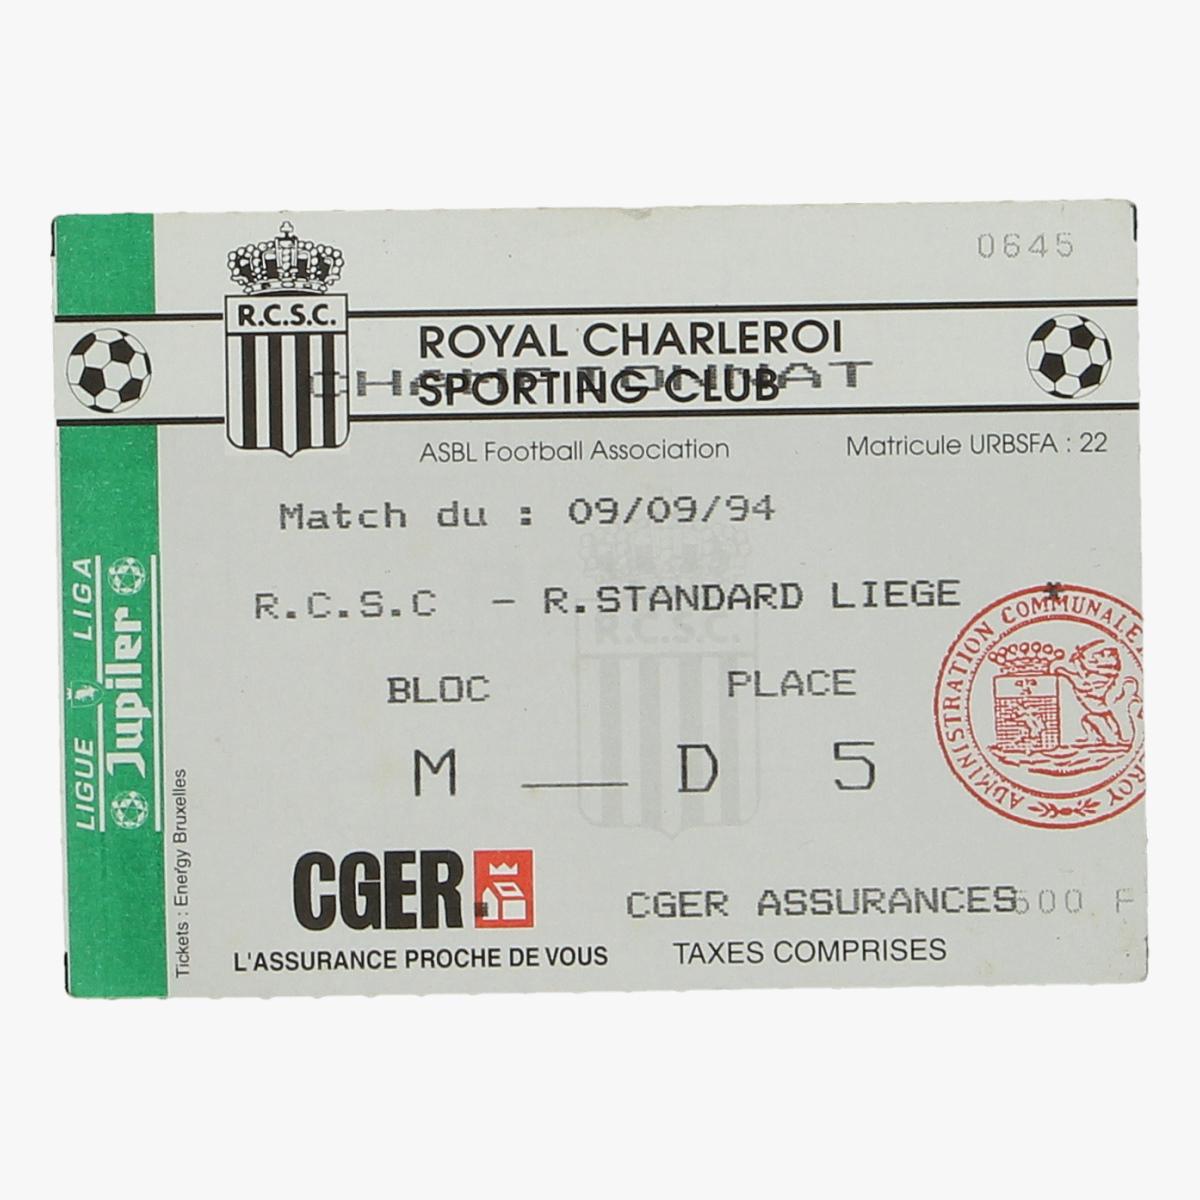 Afbeeldingen van voetbalticket royal Charleroi sporting club 09/09/94 R.C.S.C - R standard liege